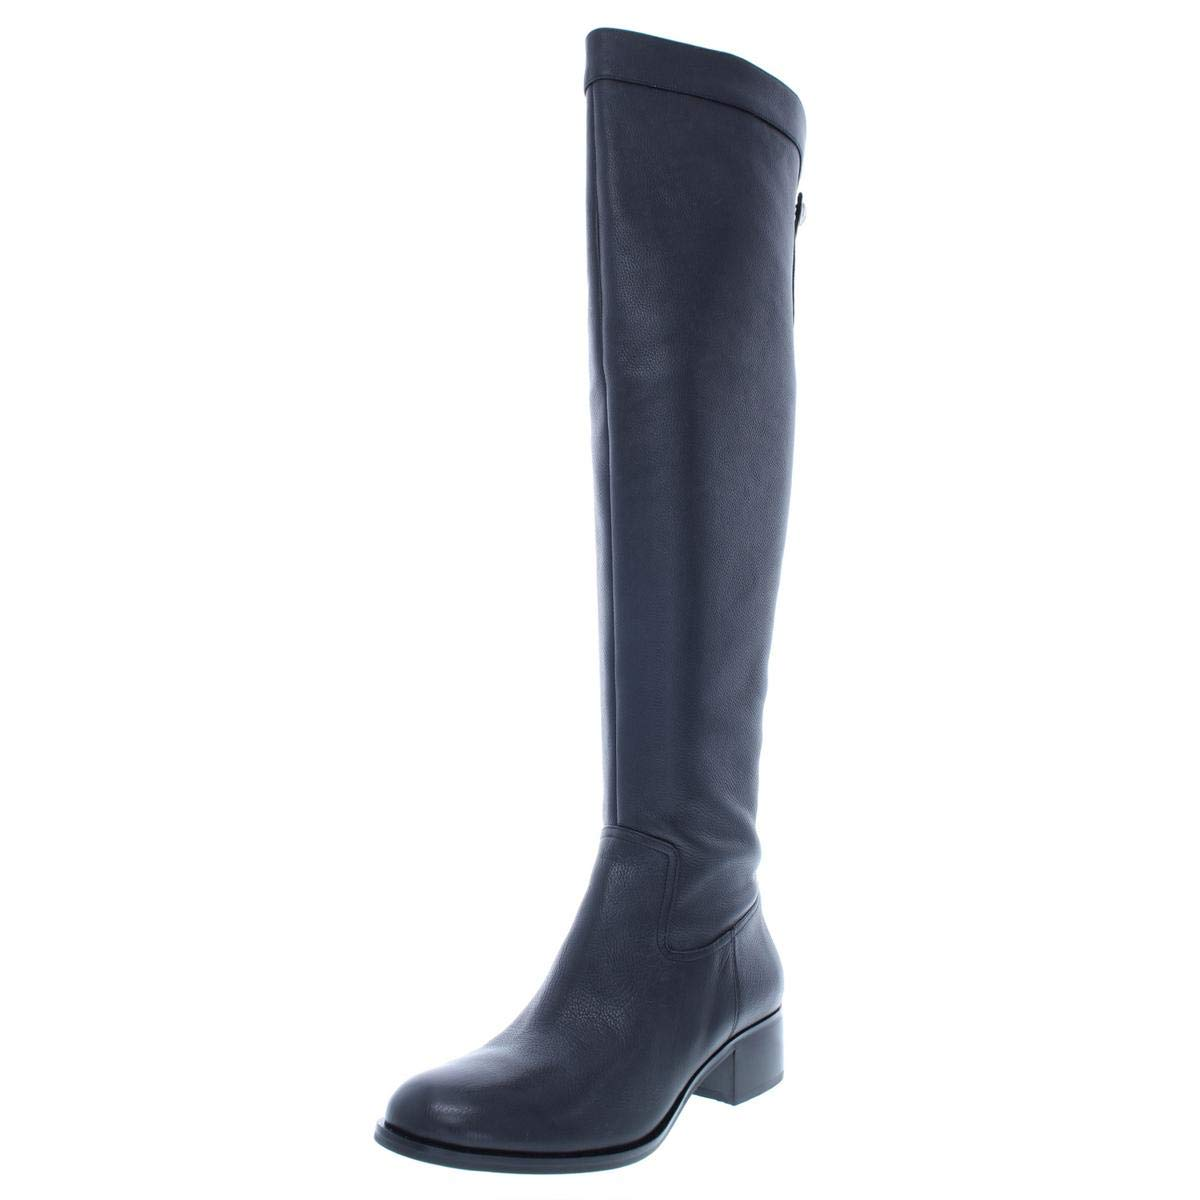 Michael Michael Kors Womens Finn Over-The-Knee Boots Black 7.5 Medium (B,M) by Michael Michael Kors